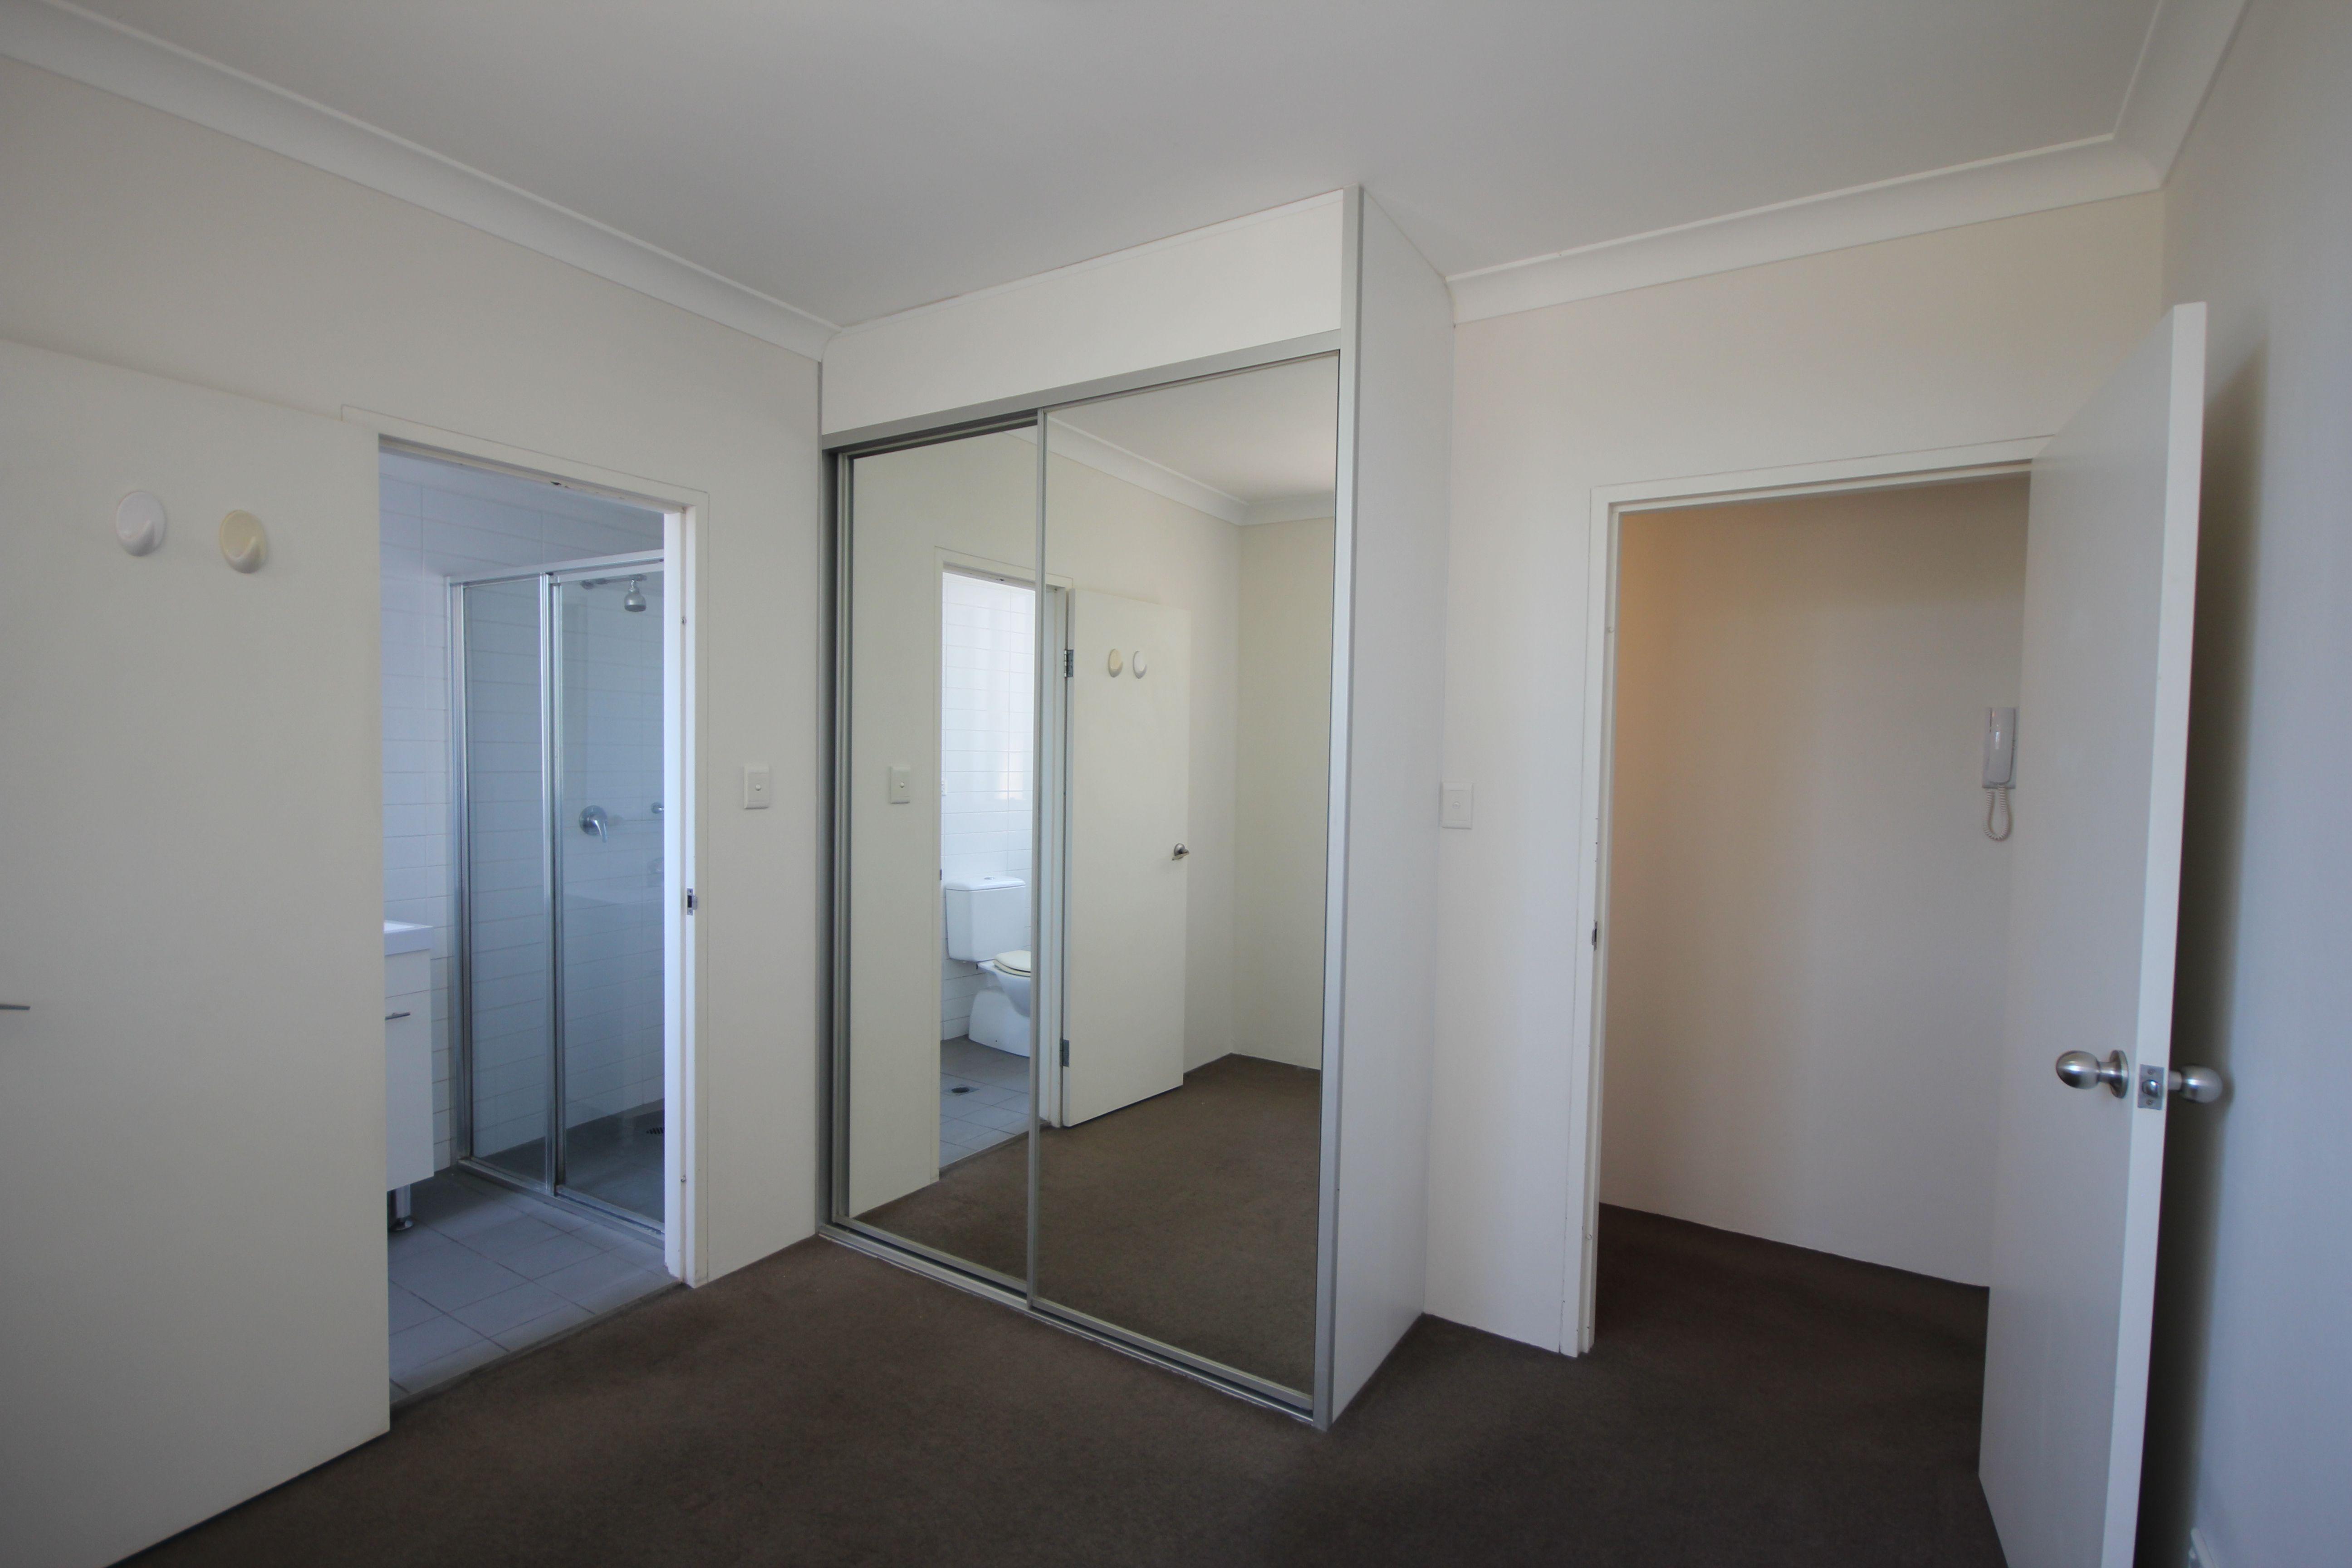 7/102-110 Parramatta Road, Homebush NSW 2140